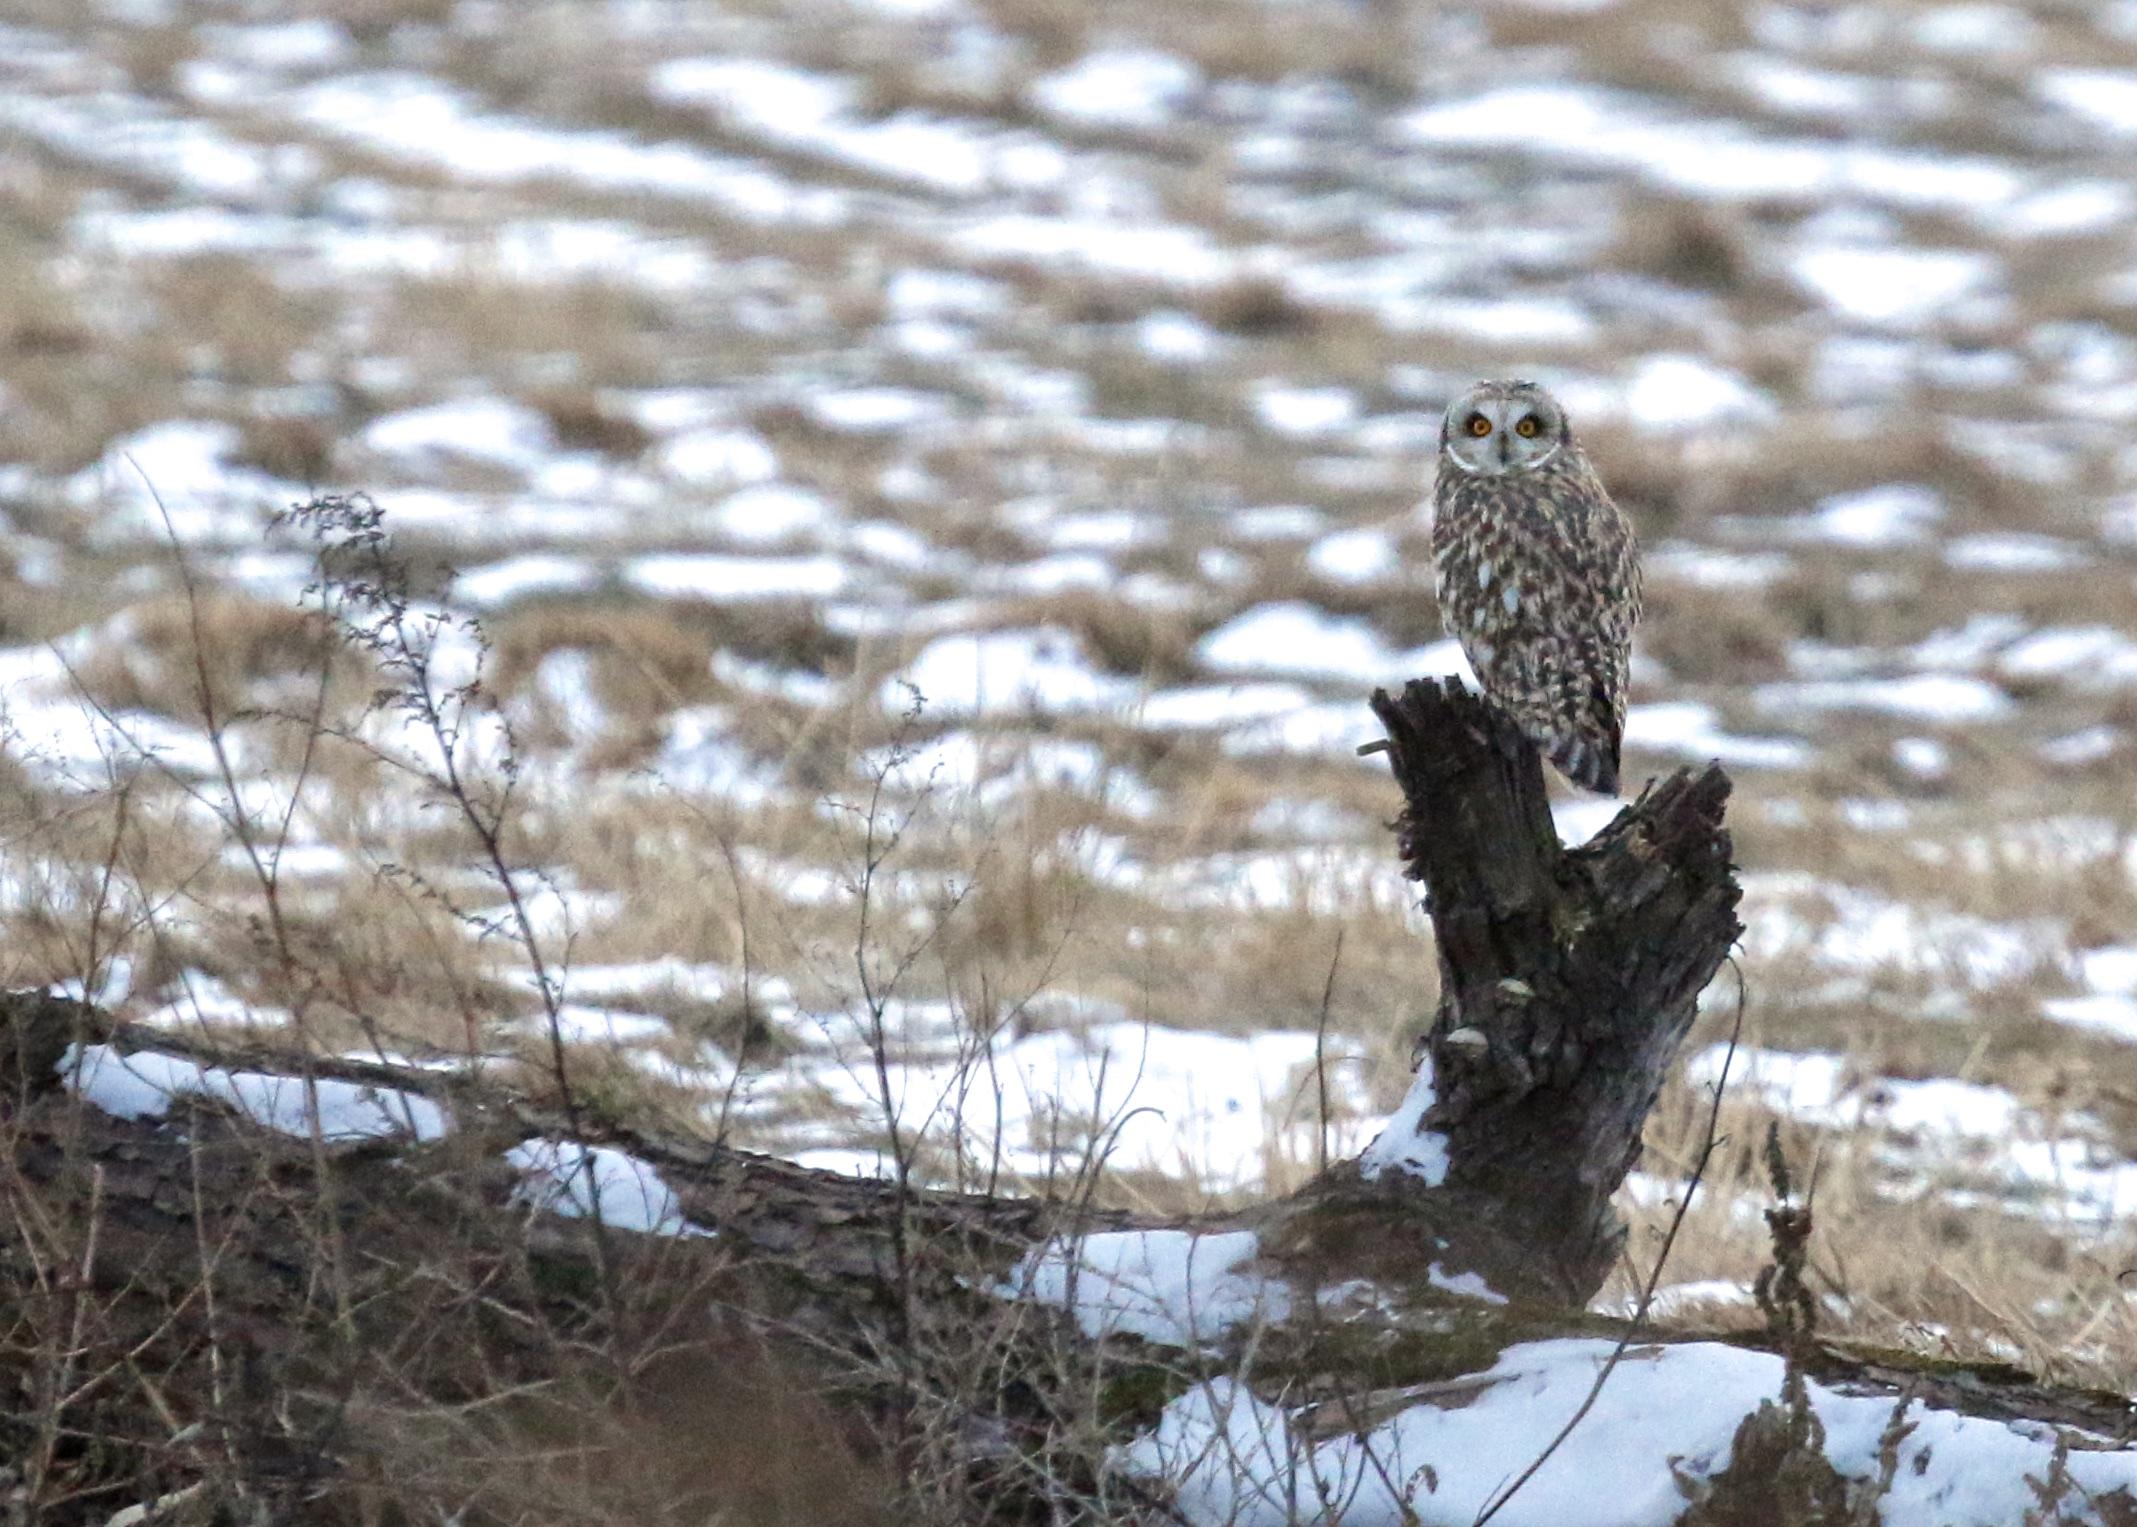 Short-eared Owl in Orange County, NY 1/11/15.